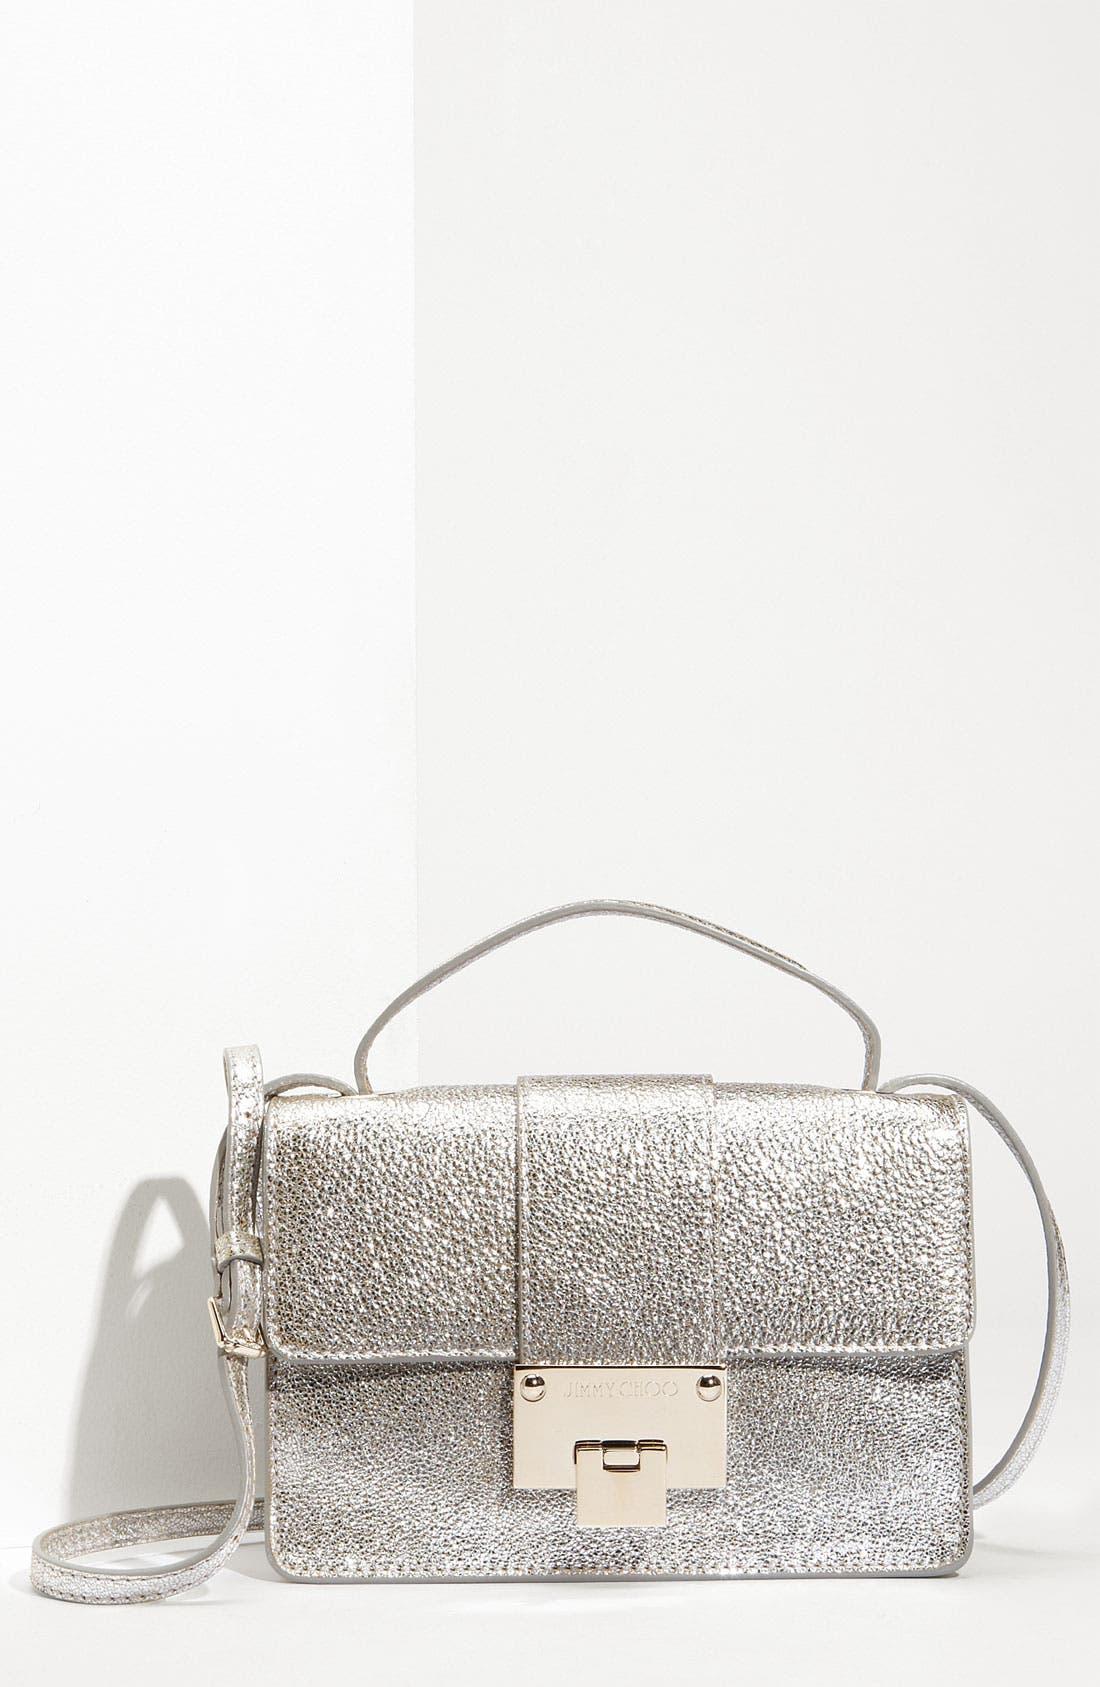 Main Image - Jimmy Choo 'Rebel Mini' Glitter Leather Crossbody Bag